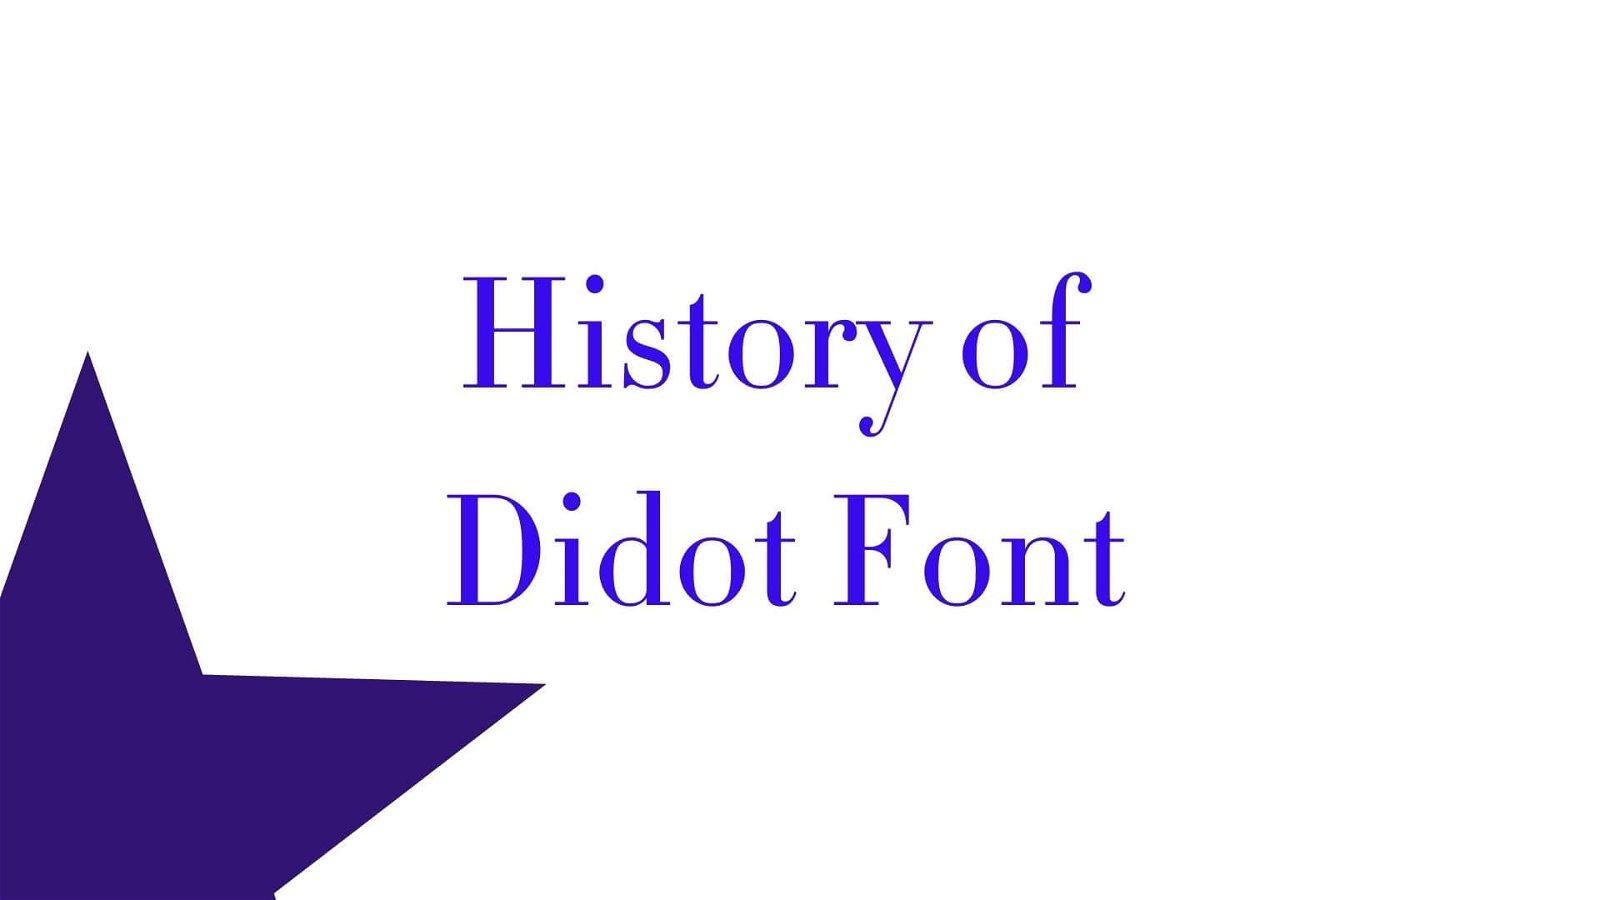 History of Didot Font